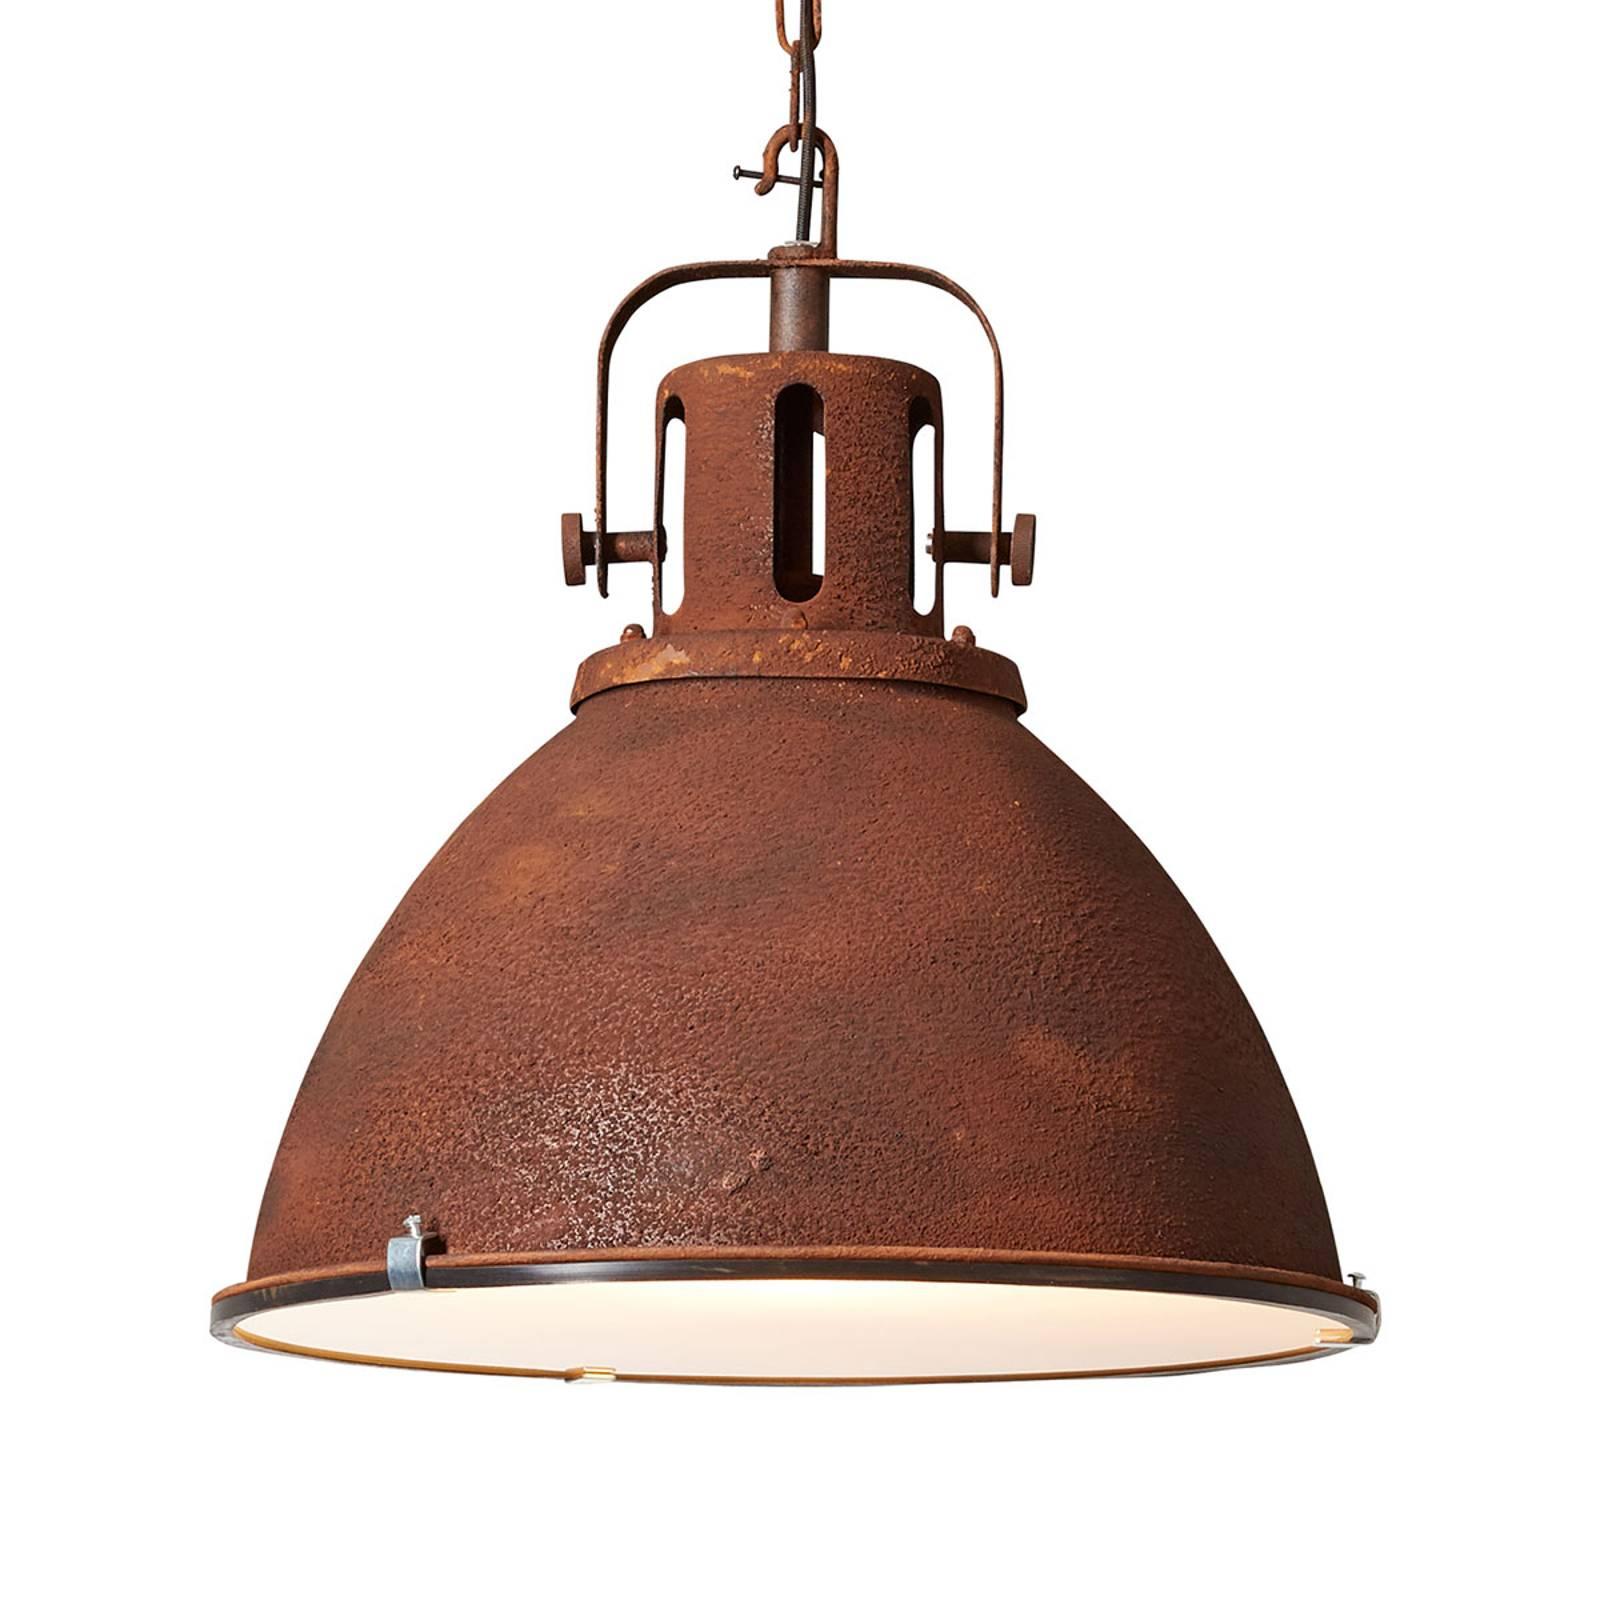 Hanglamp Jesper in industriële stijl